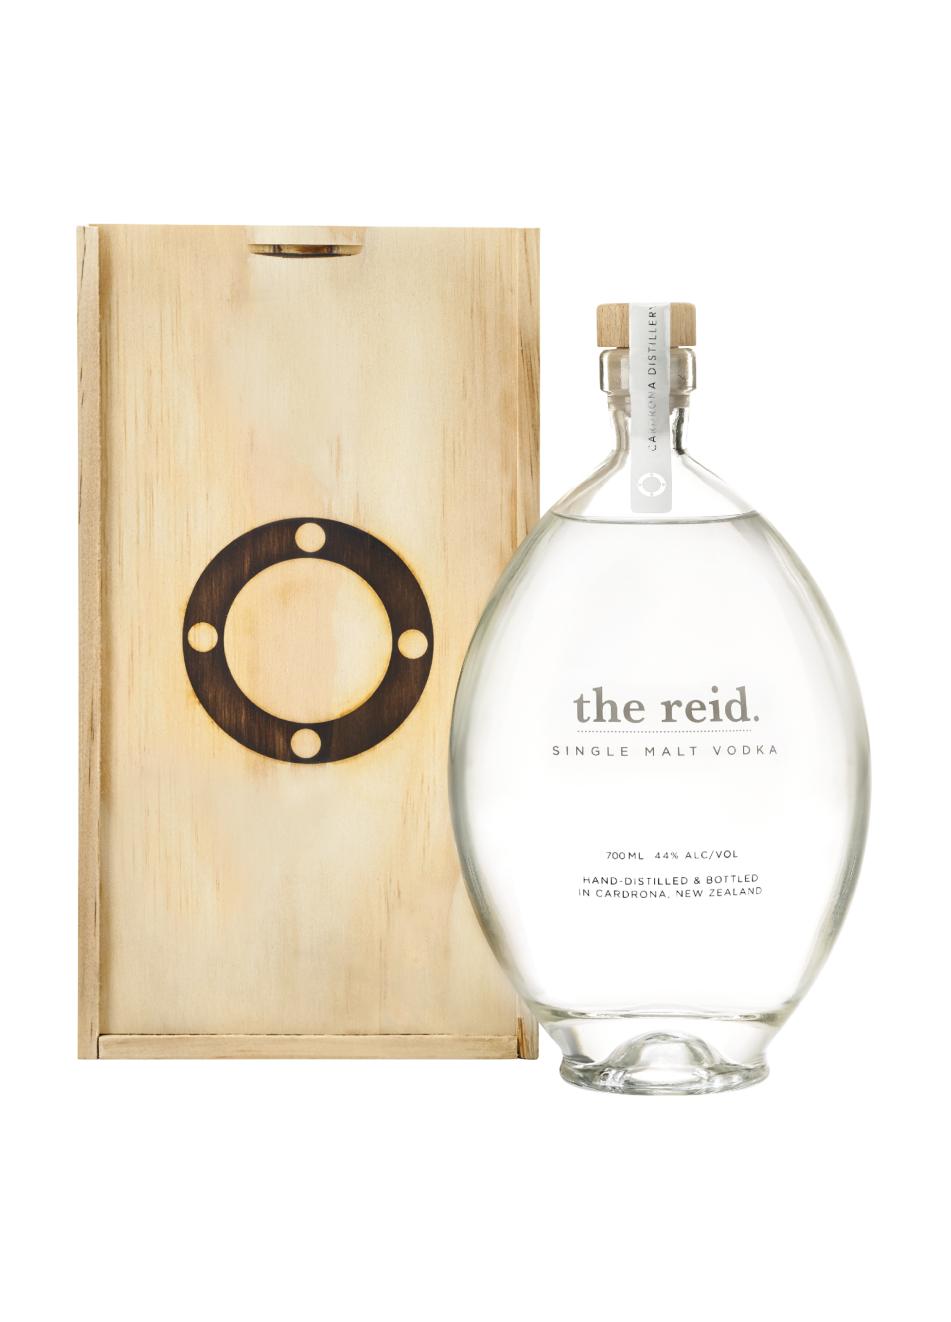 the reid Vodka